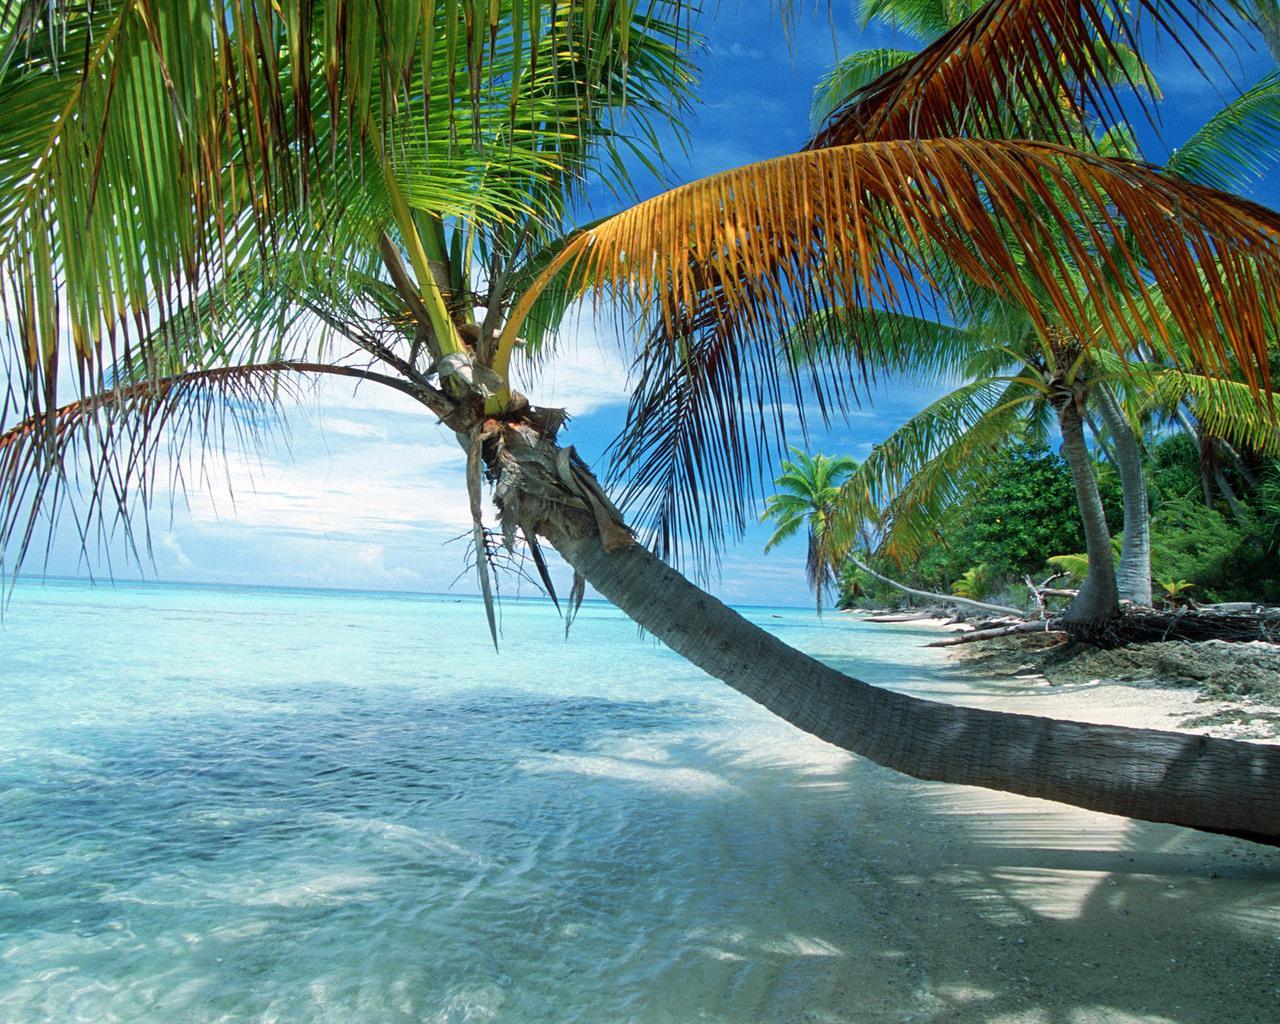 http://2.bp.blogspot.com/_T5UlQql8sHM/TG1oi9br6aI/AAAAAAAACbA/OXcI0-GIdSw/s1600/beach.jpg